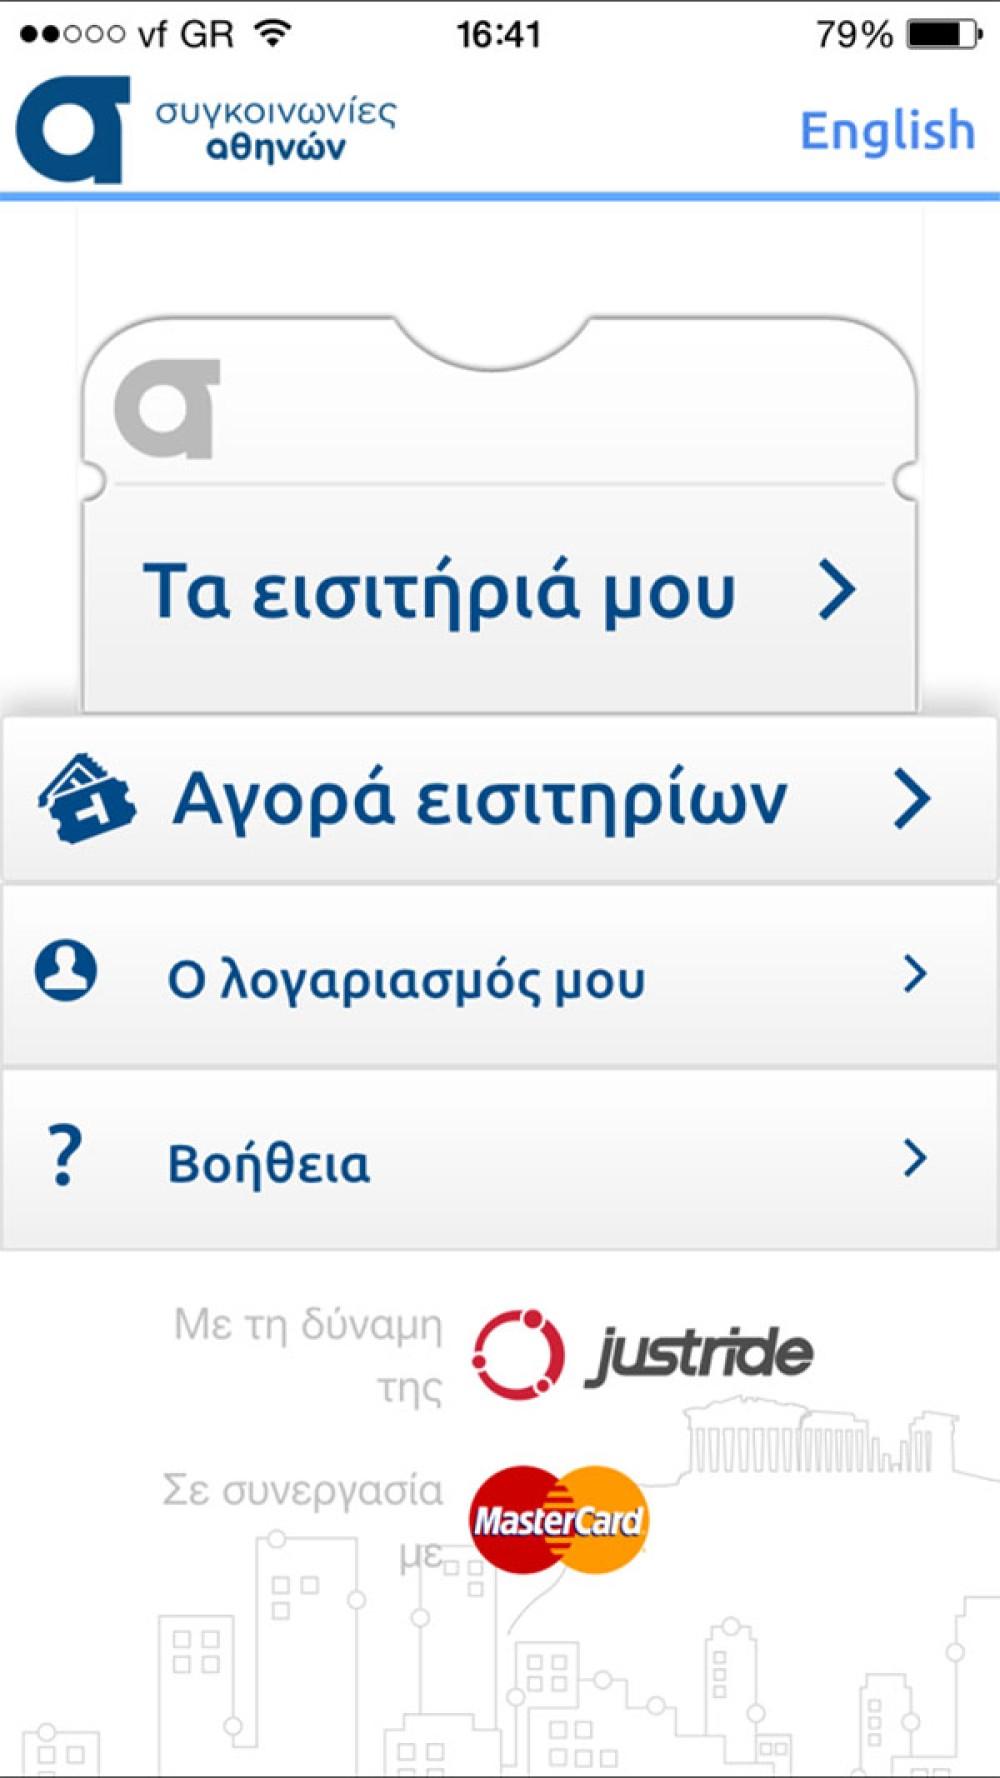 TfA tickets: Τώρα μπορείς να αγοράζεις εισιτήρια για τα ΜΜΜ του ΟΑΣΑ από το smartphone/tablet σου